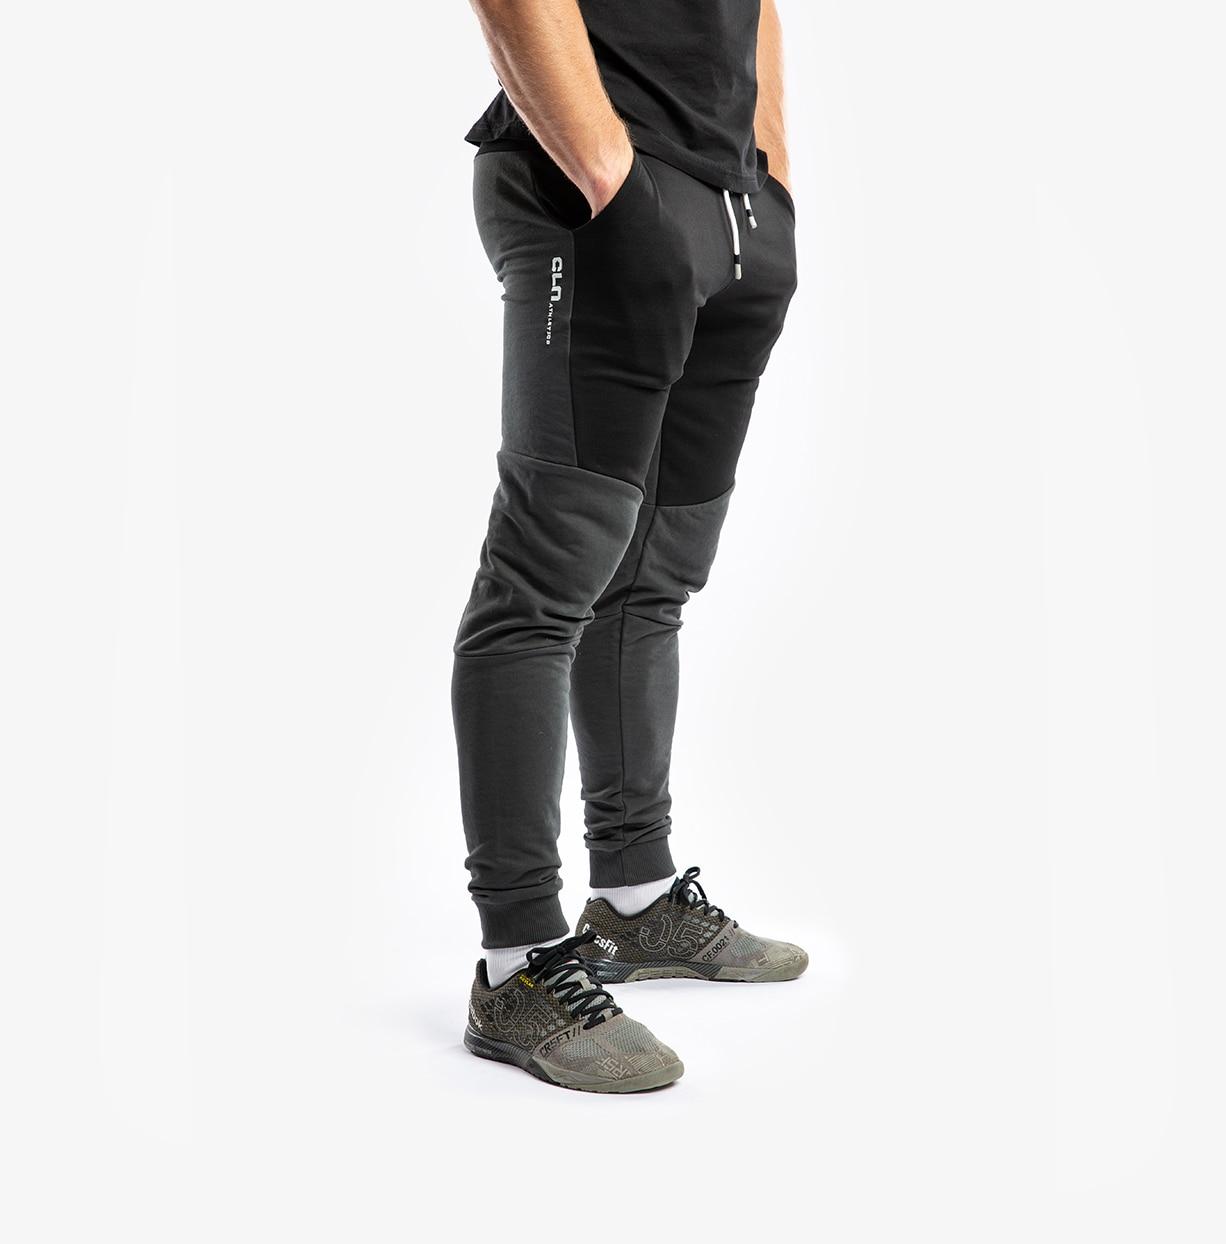 CLN Redirect Pants Black